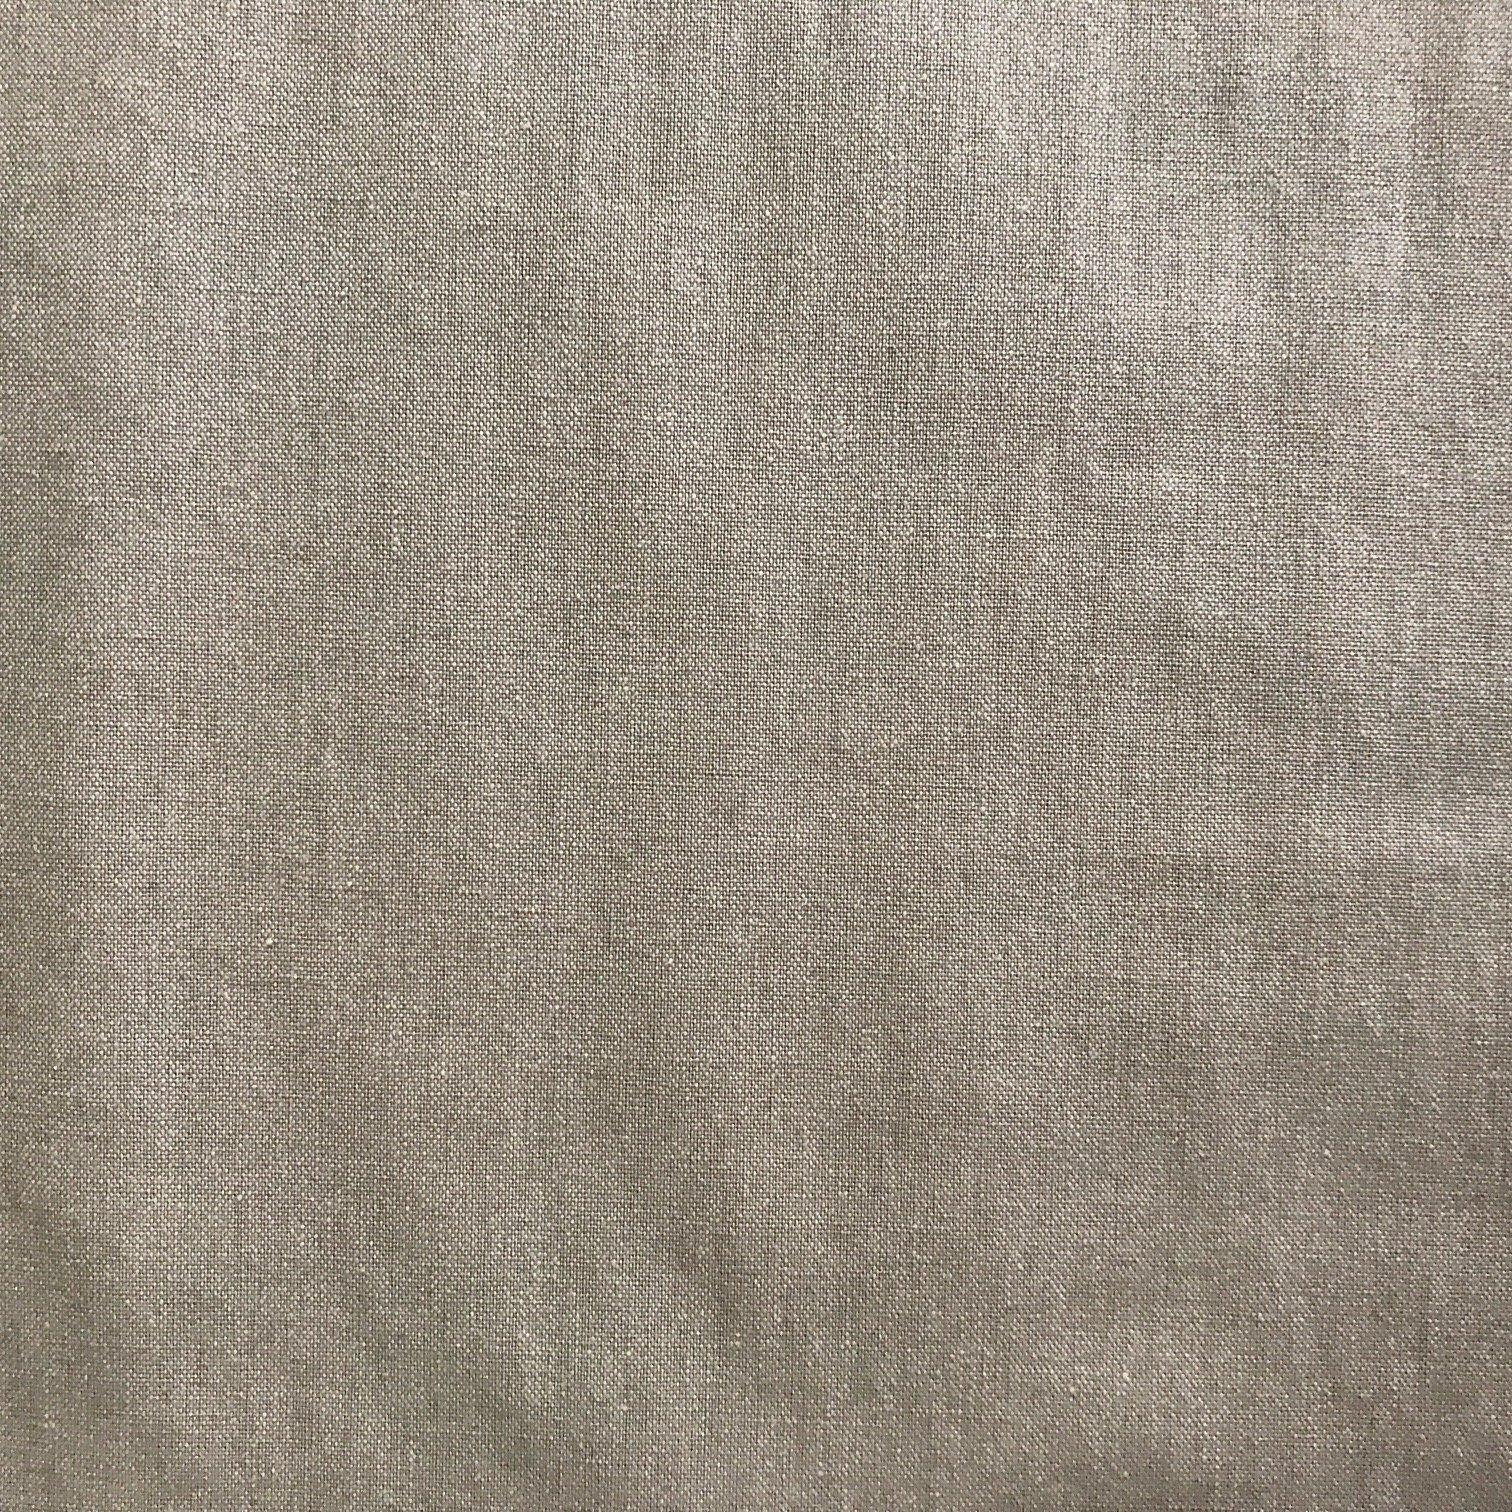 3/4 YARD- Irome Muji - Wheat - Cotton/Linen Blend - Kokka